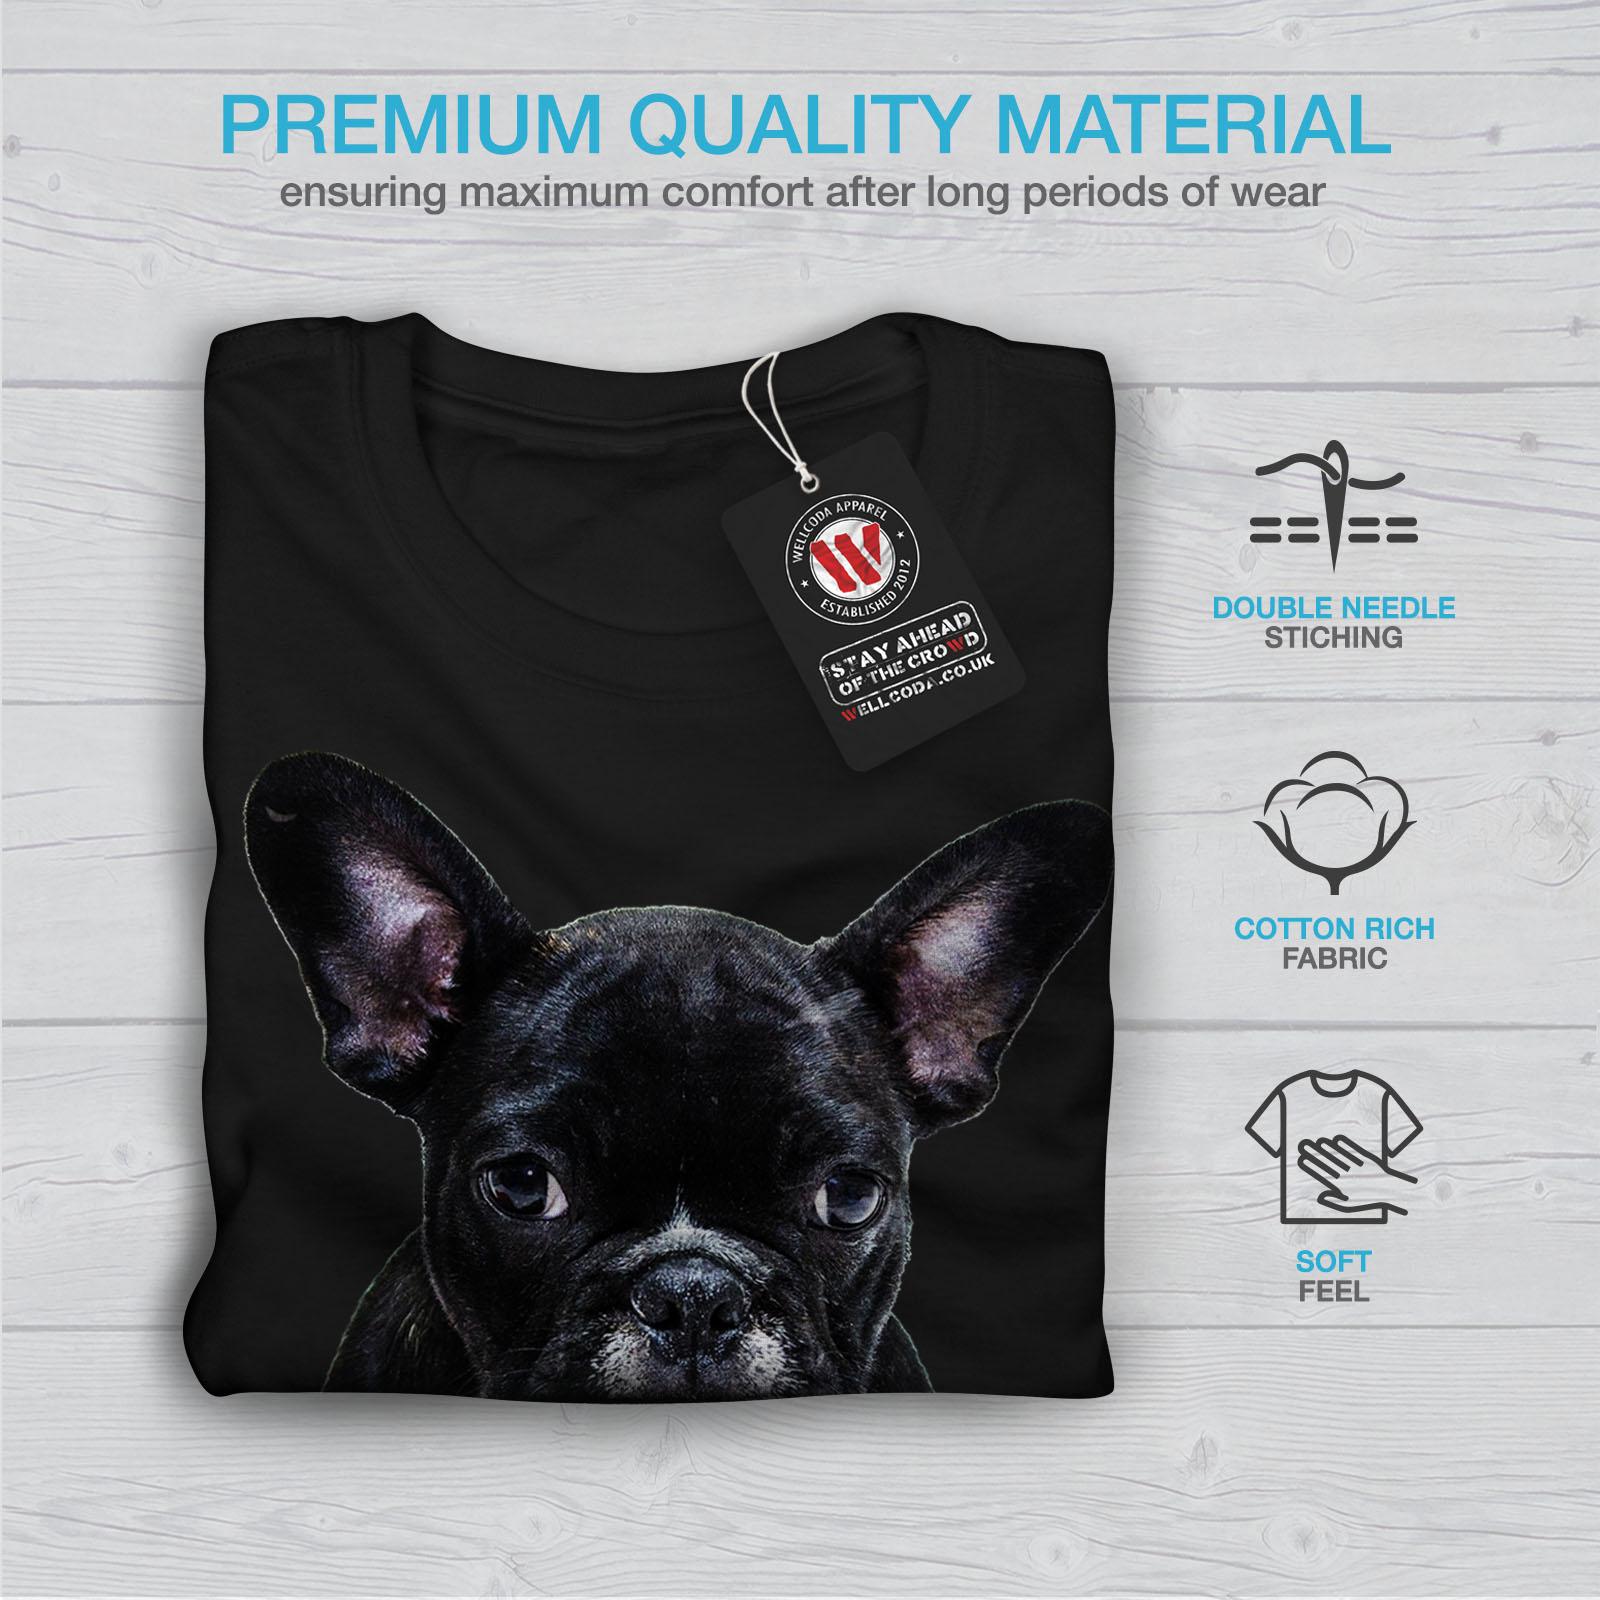 Wellcoda-Fancy-French-Bulldog-T-shirt-Femme-Noir-Casual-Design-Imprime-Tee miniature 7